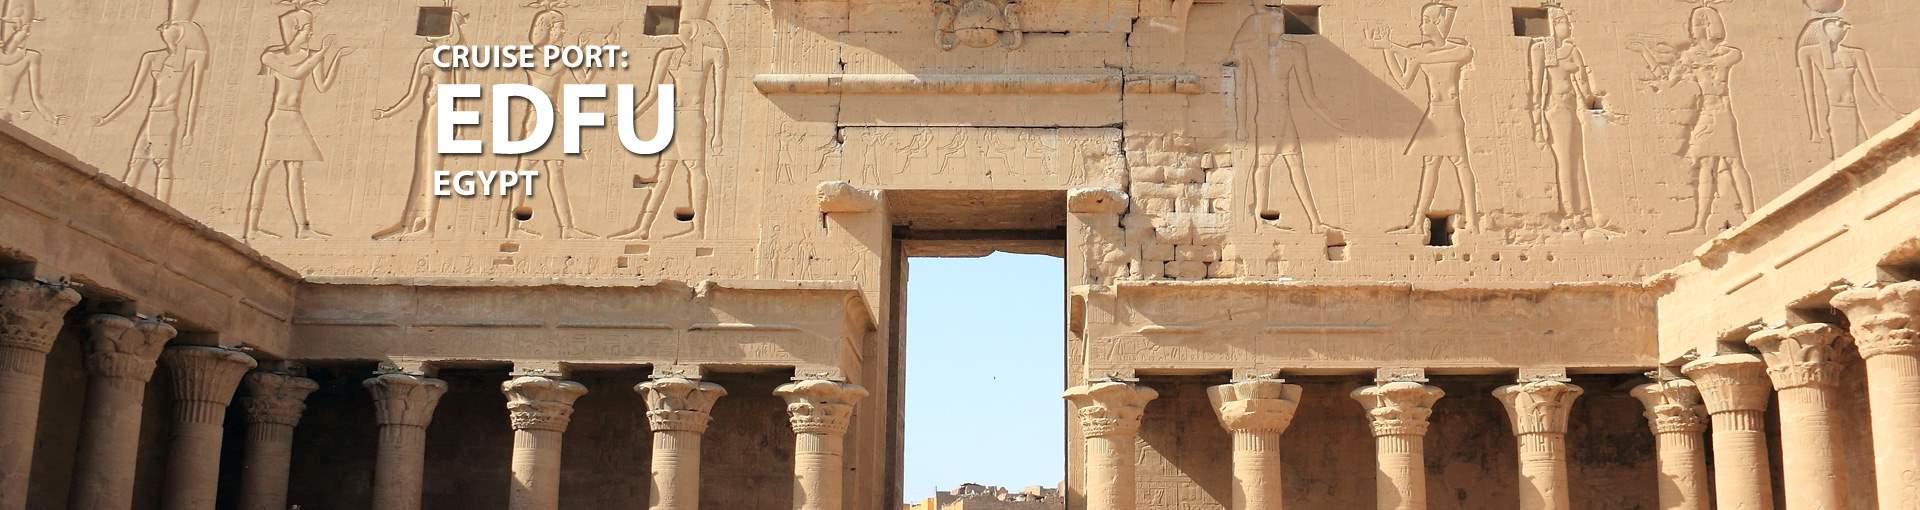 Cruises to Edfu, Egypt